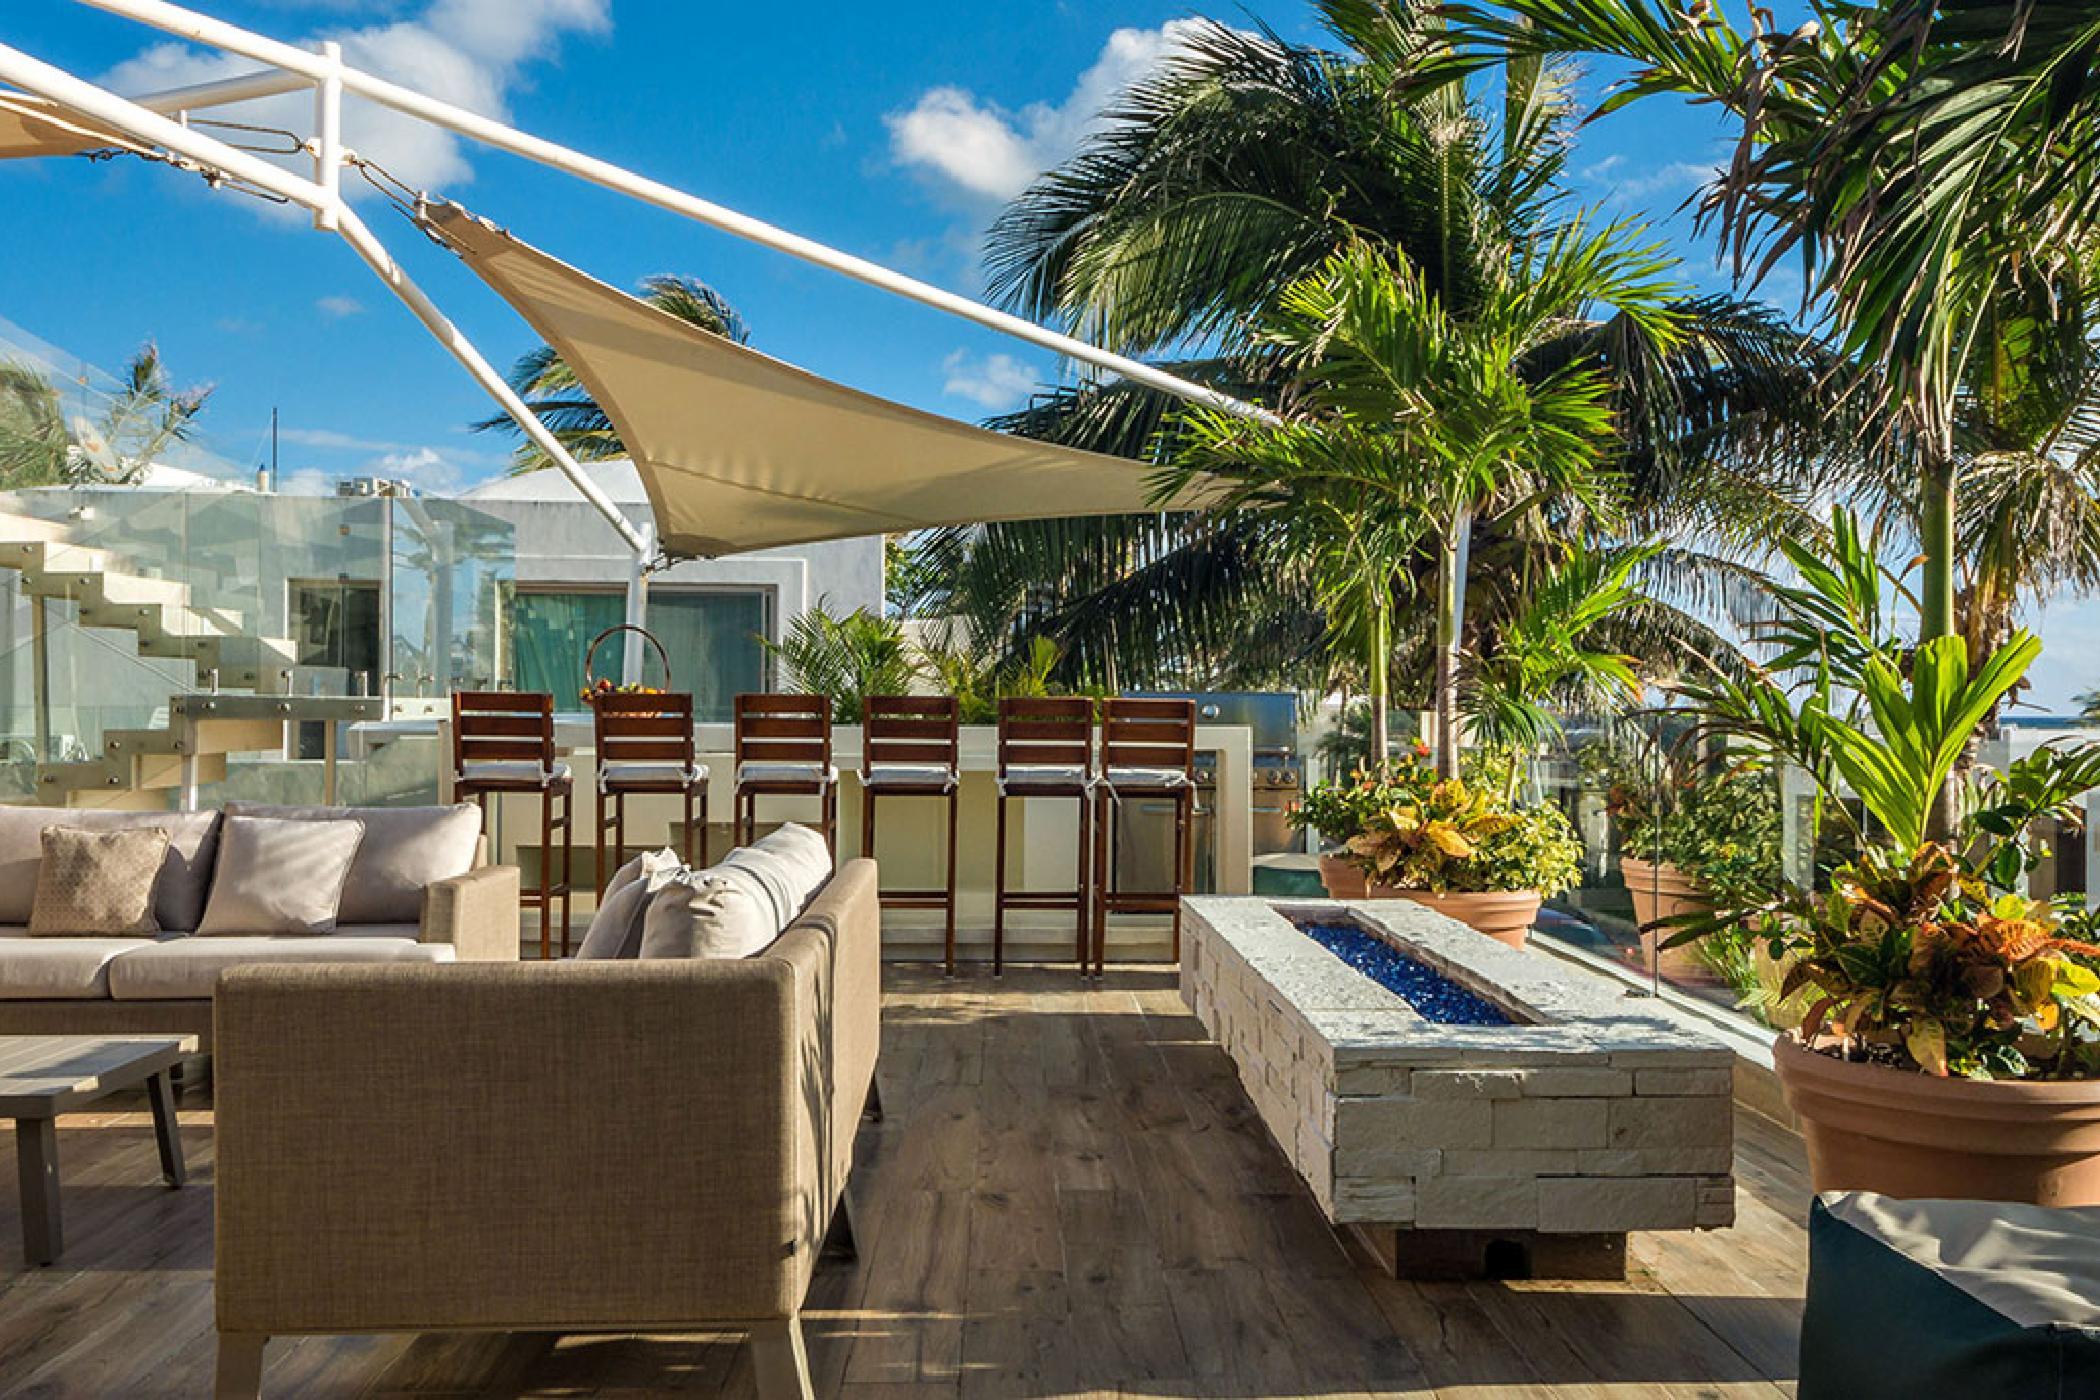 Maya_Luxe_Riviera_Maya_Luxury_Villas_Experiences_Vista_Hermosa_9.jpg